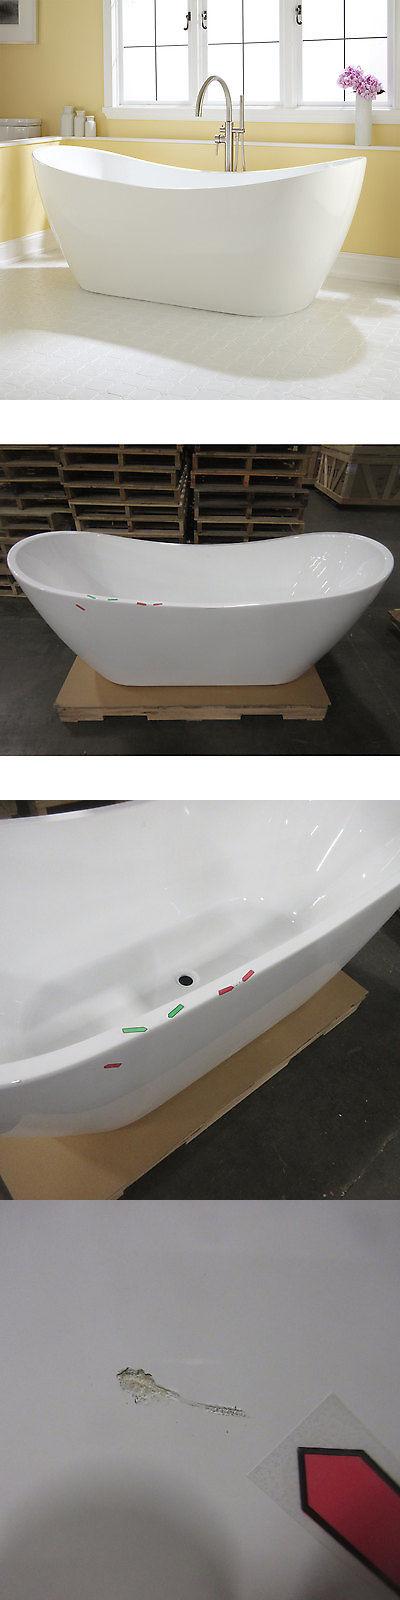 Bathtubs 42025: Signature Hardware Sale 72 Sheba Acrylic Double ...